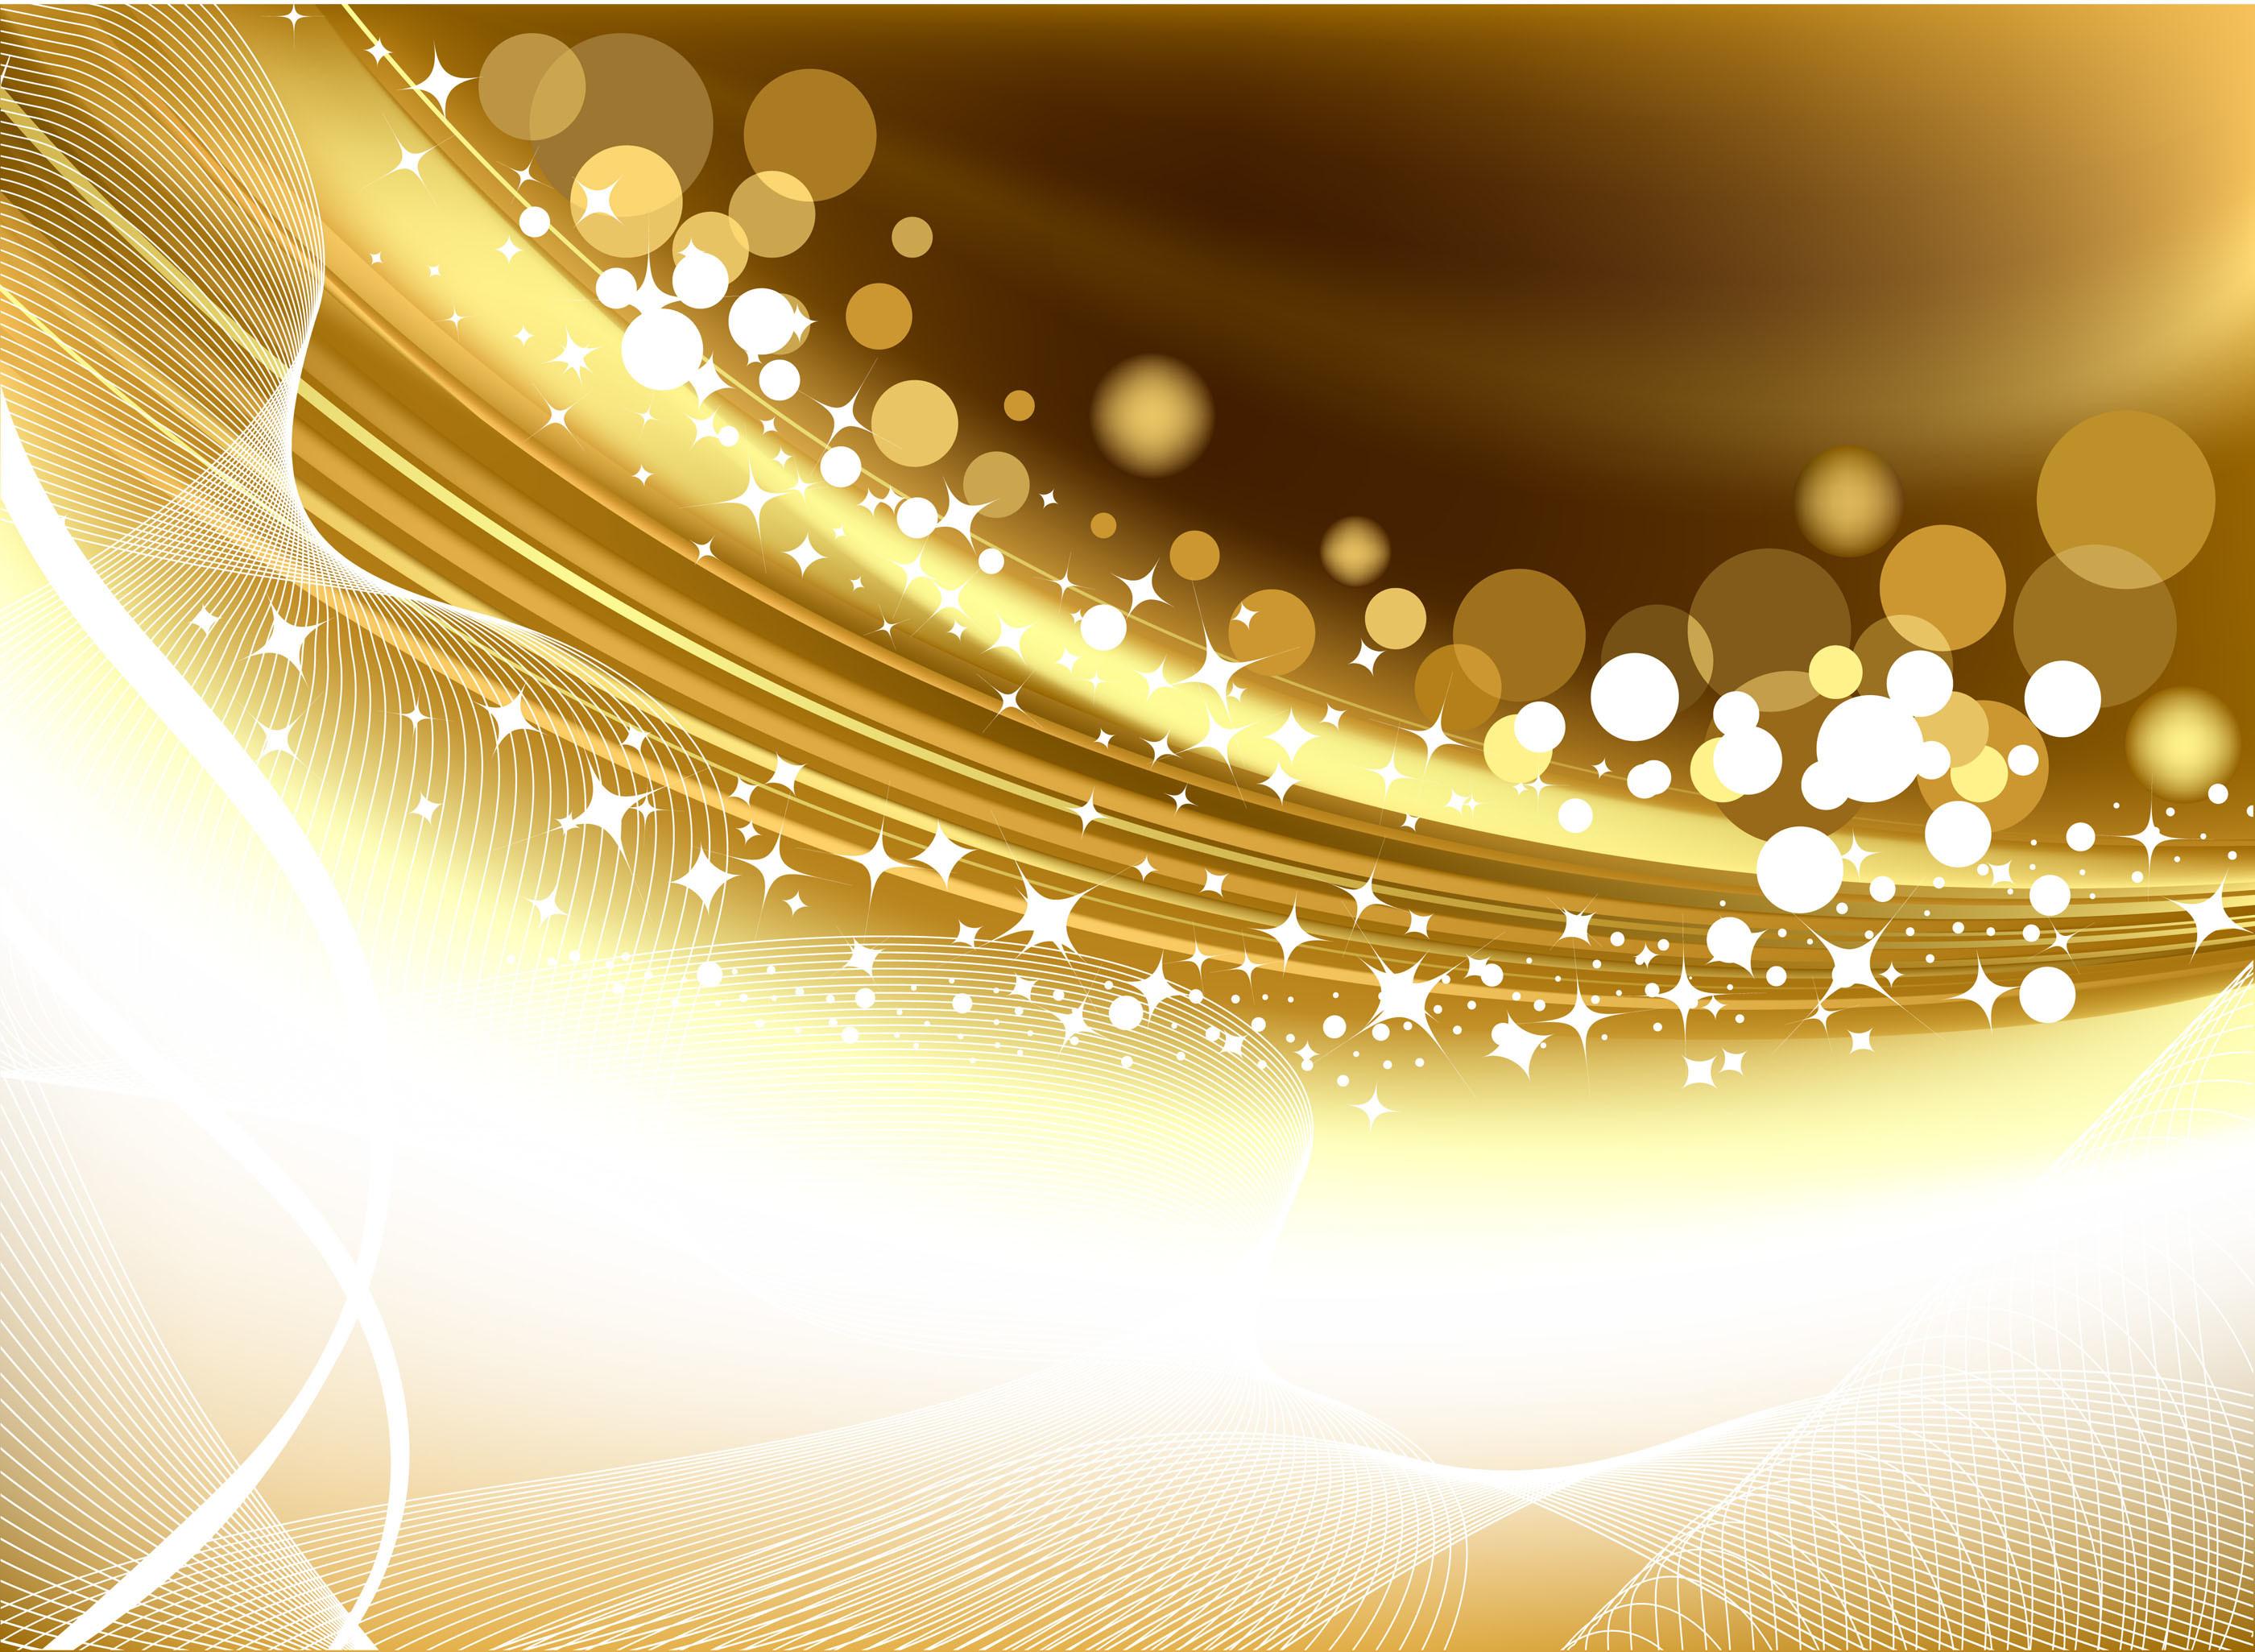 Gold Random Spiral Swirls Wallpaper 1800×1600 px Free Download .